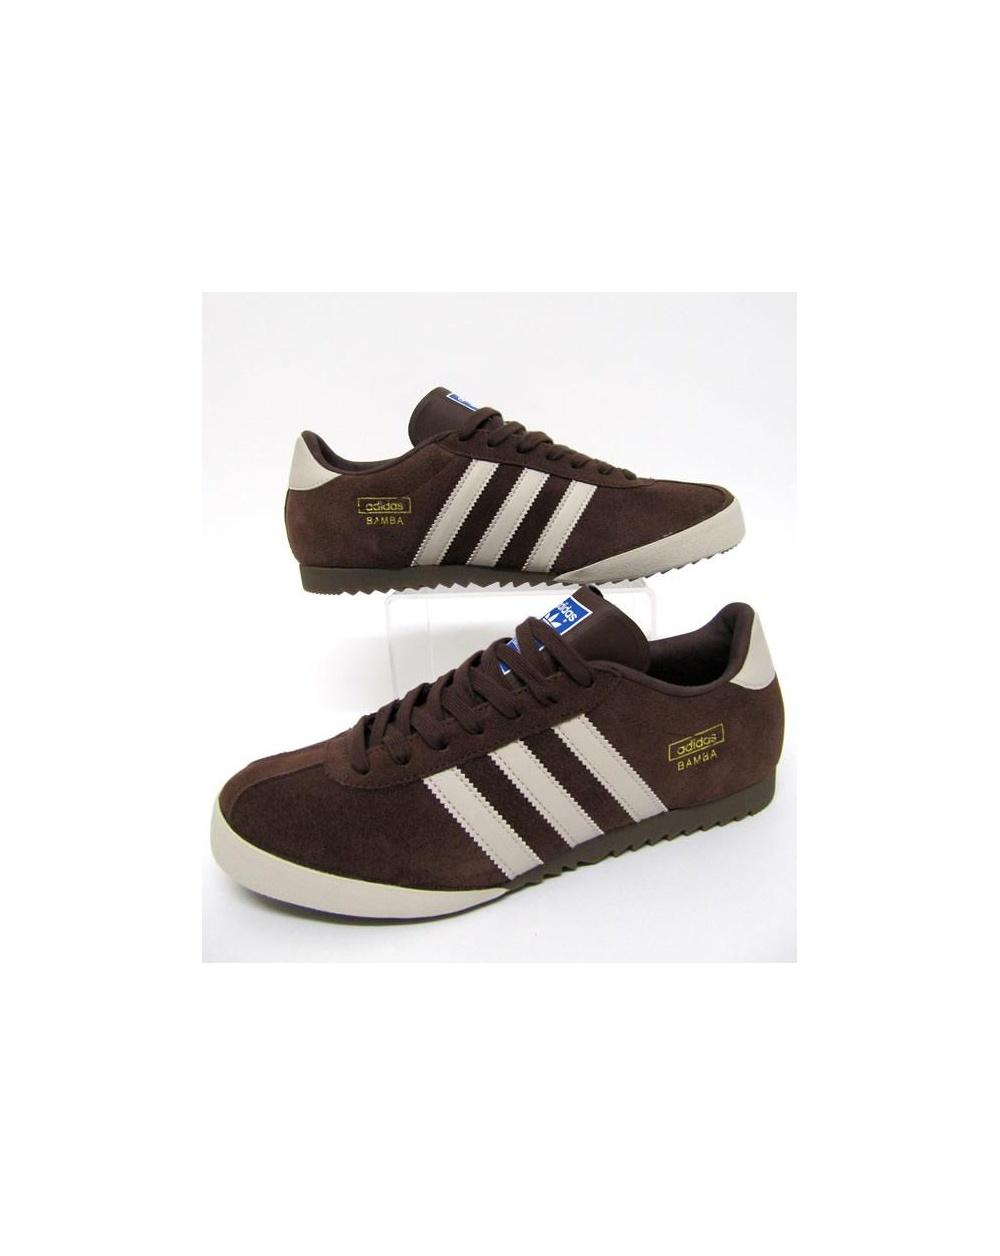 ffdfc08a8e581 Adidas Bamba Trainers Brown Cream Gold